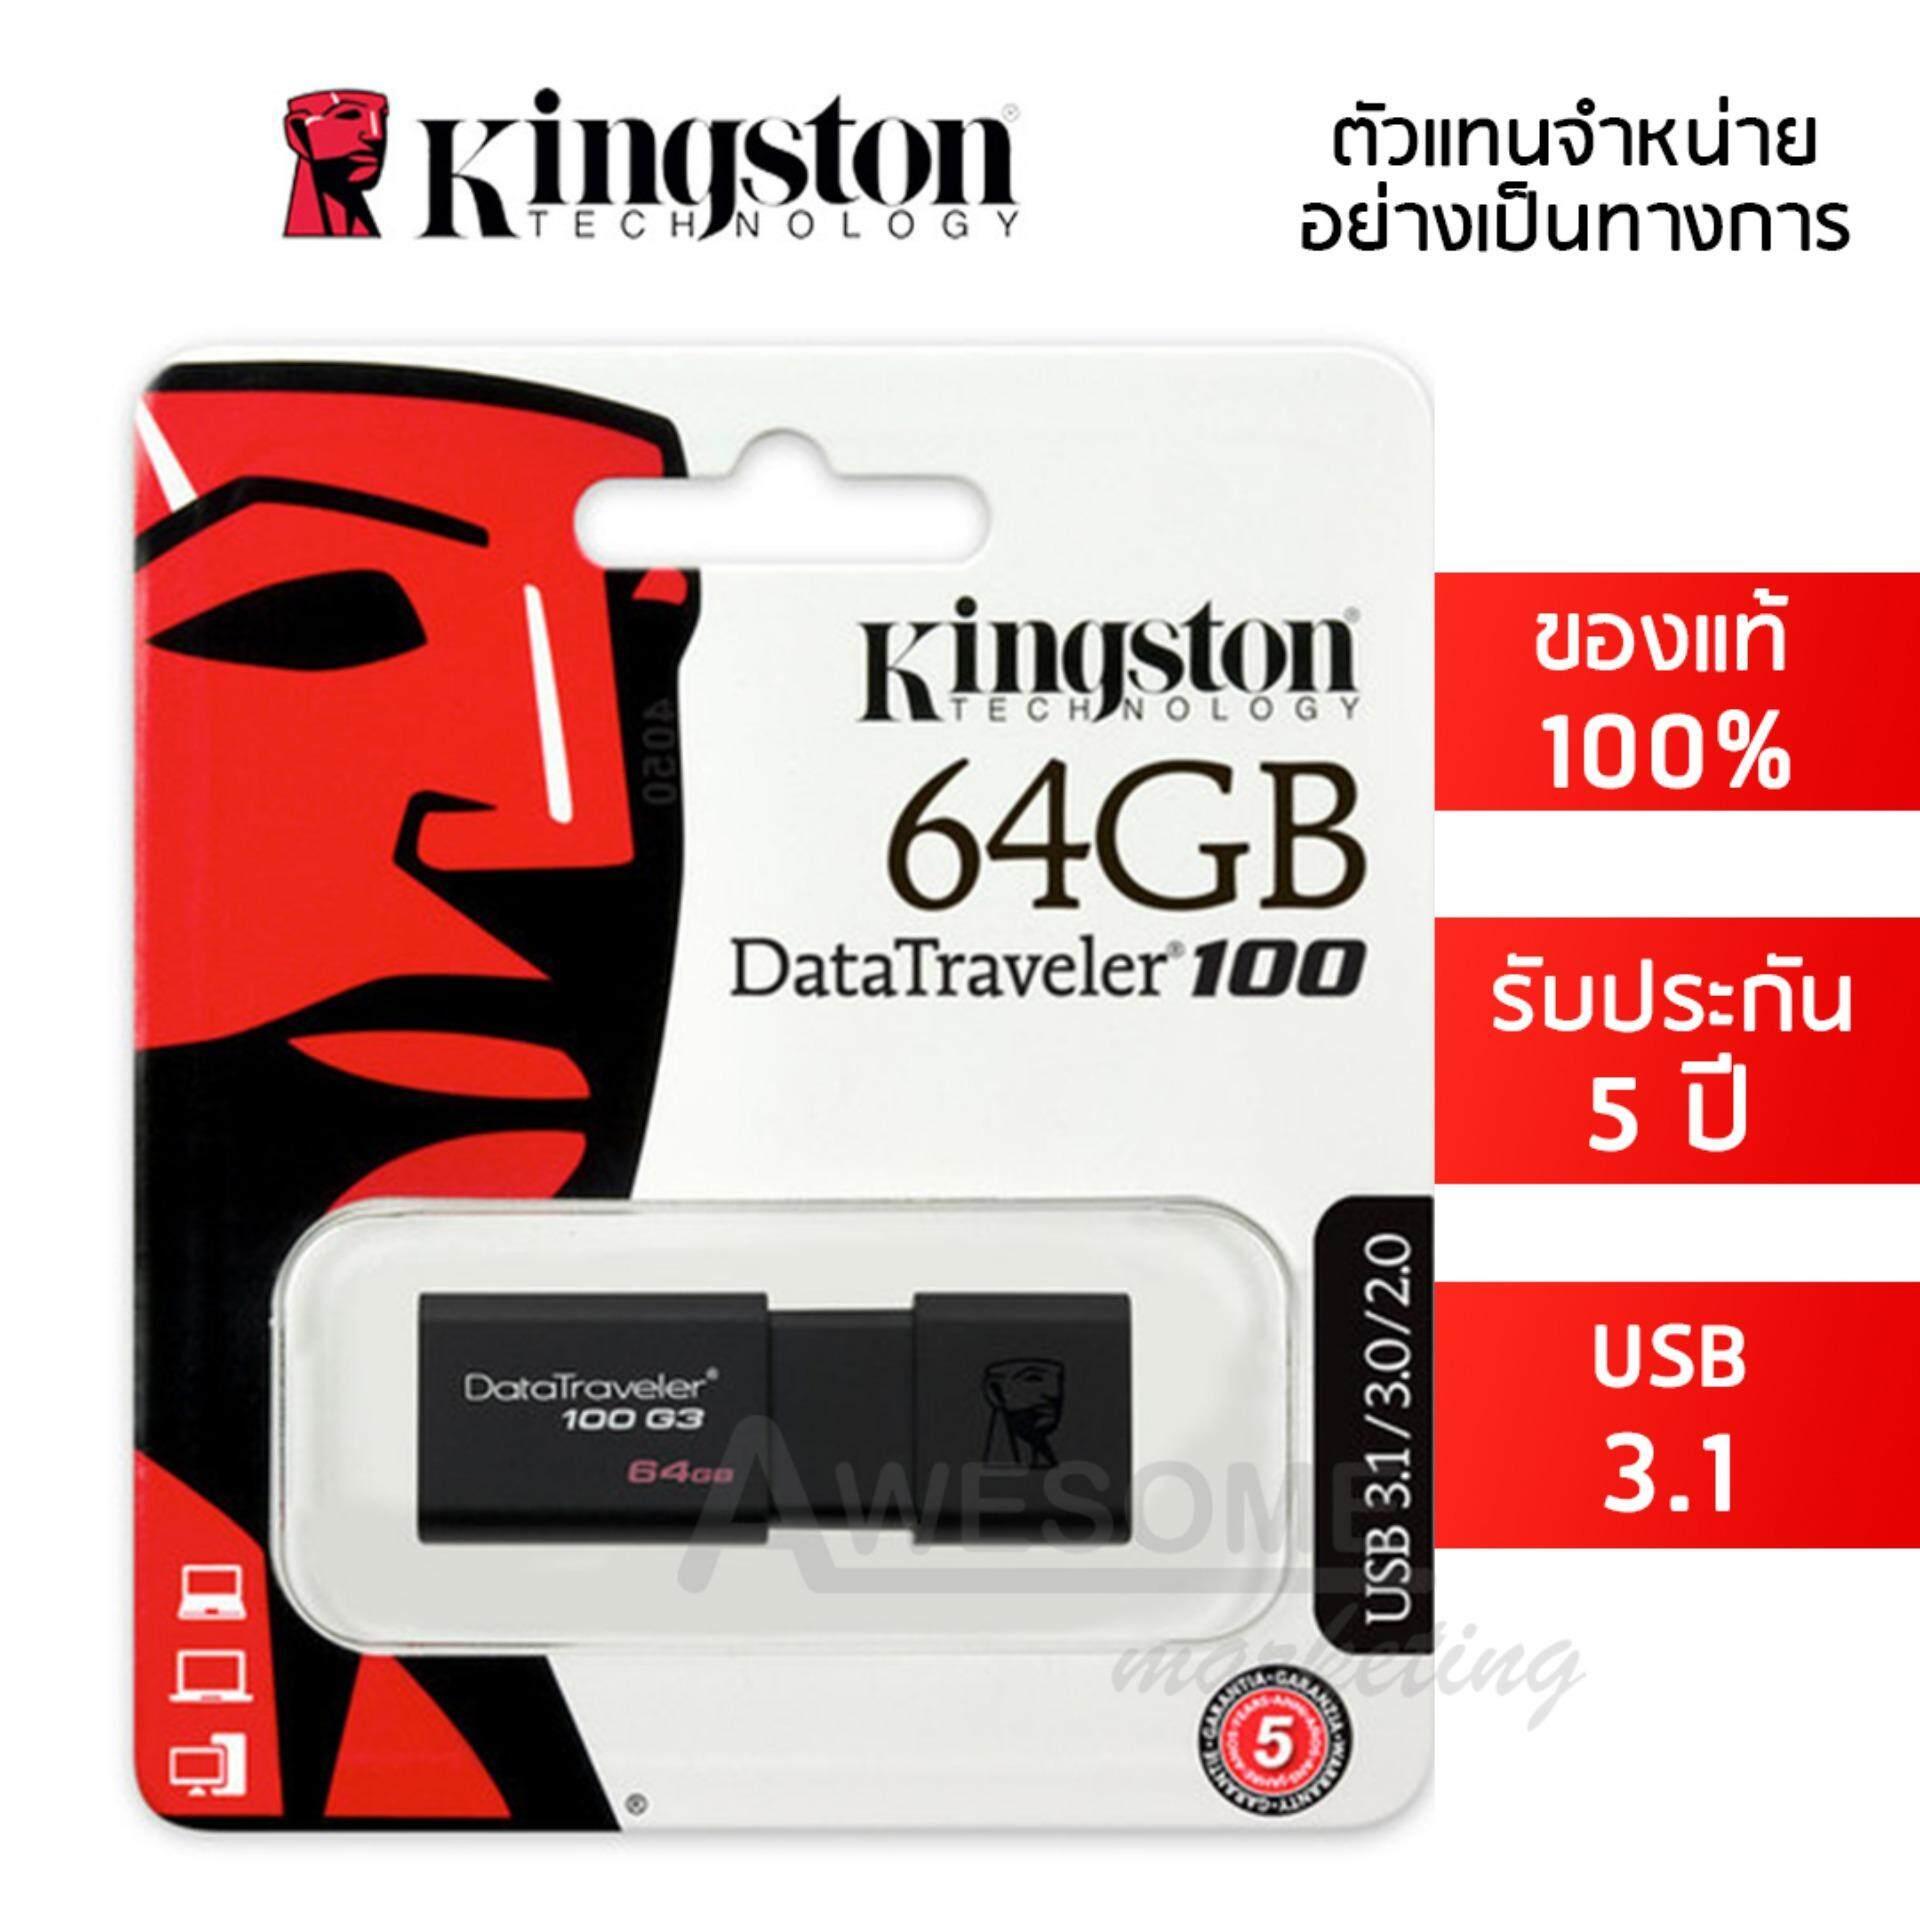 Kingston 64gb Datatraveler 100g3 Flash Drive Usb 3.1 ความเร็วสูงสุด 100 Mb/s.